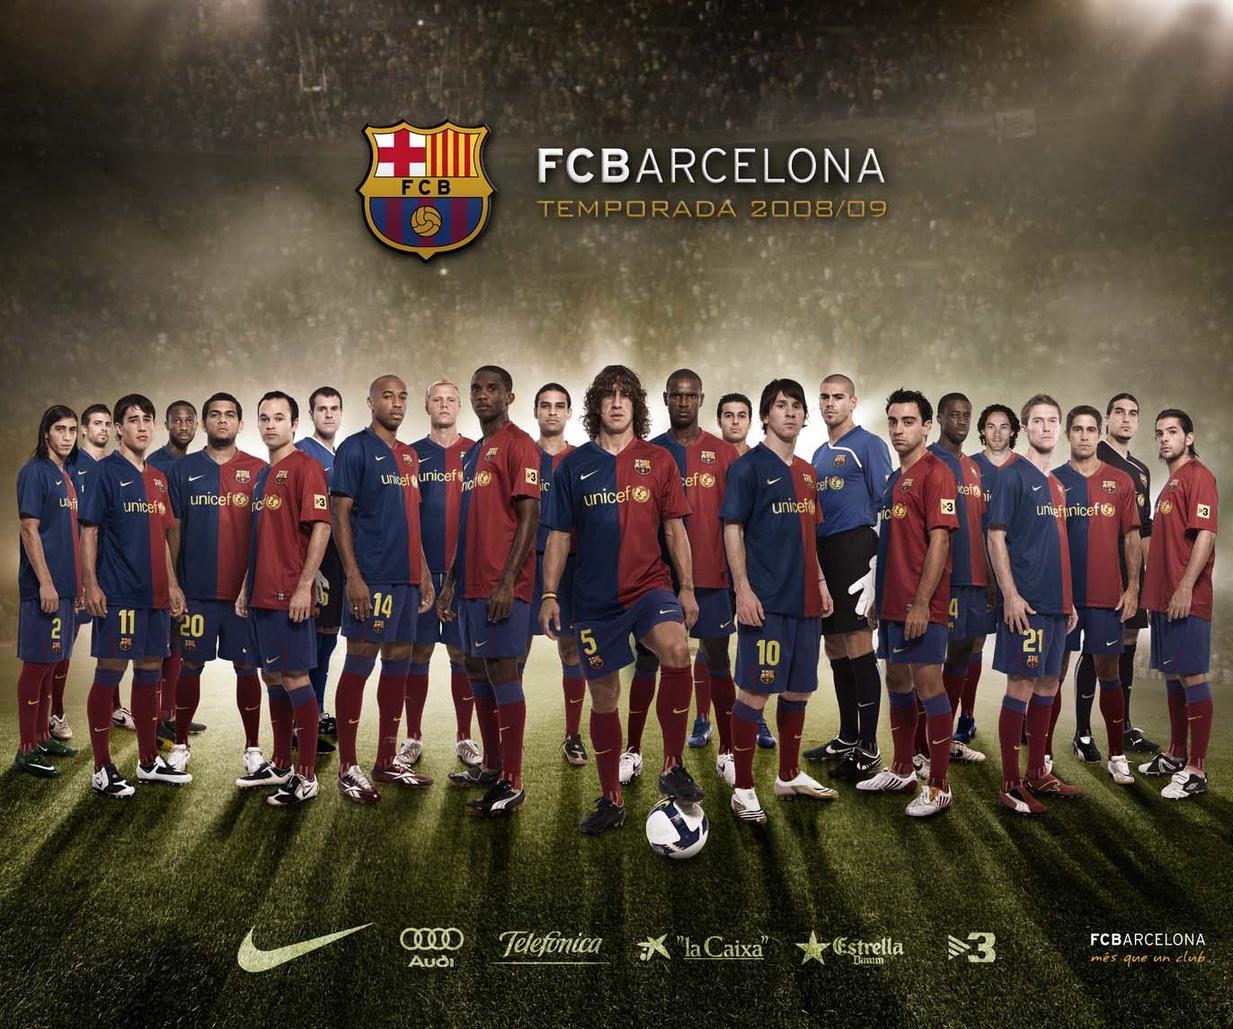 http://3.bp.blogspot.com/-RnVxm2R0s2g/Tl09CGuPUXI/AAAAAAAAIeM/sGo_u-m5t3I/s1600/Barcelona-Football-Club-Poster.jpg